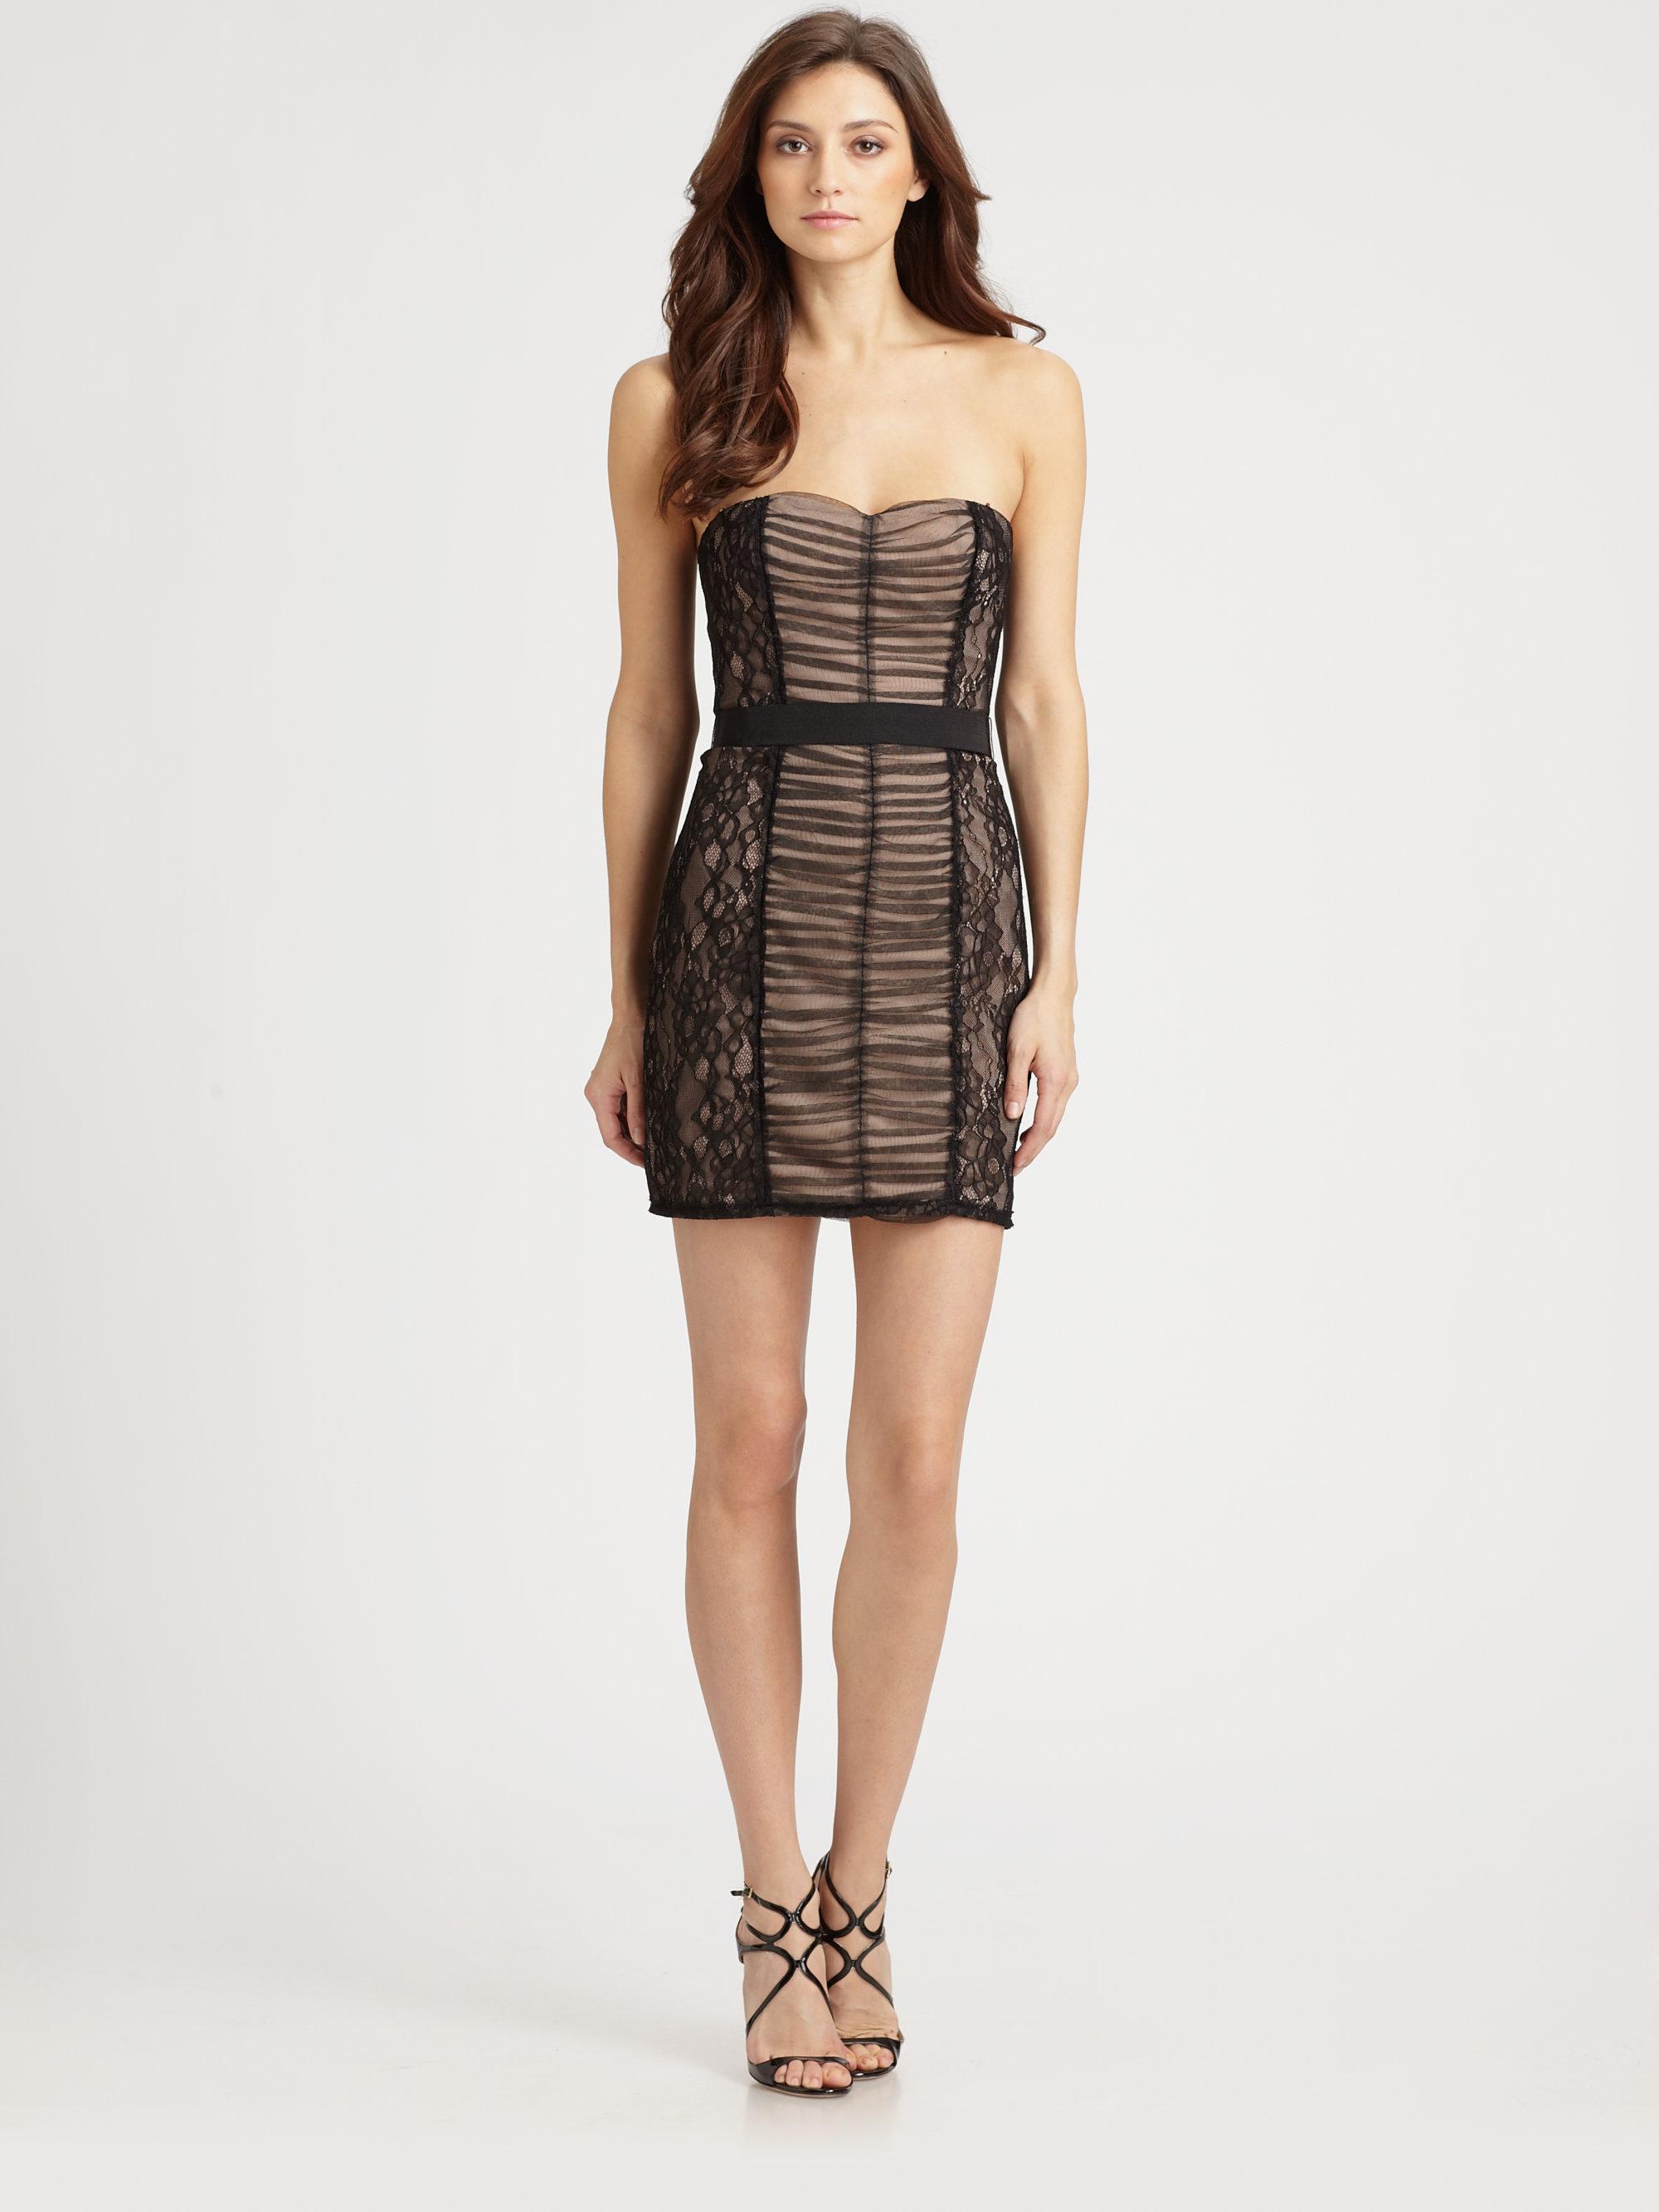 Bcbgmaxazria Strapless Lace Dress in Black - Save 44%   Lyst